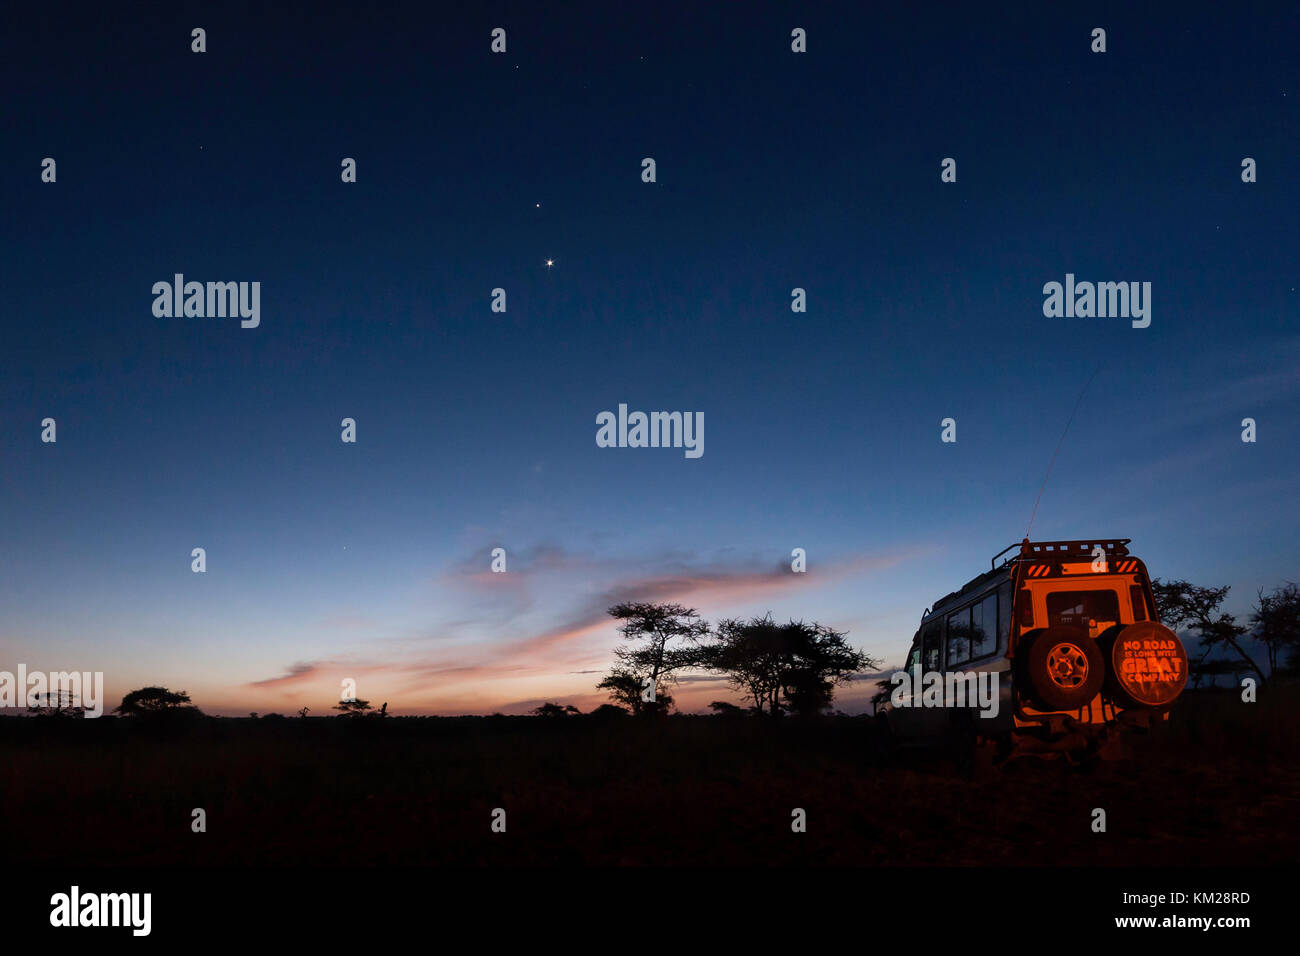 Safari jeep parked at night in the Serengeti, Tanzania - Stock Image